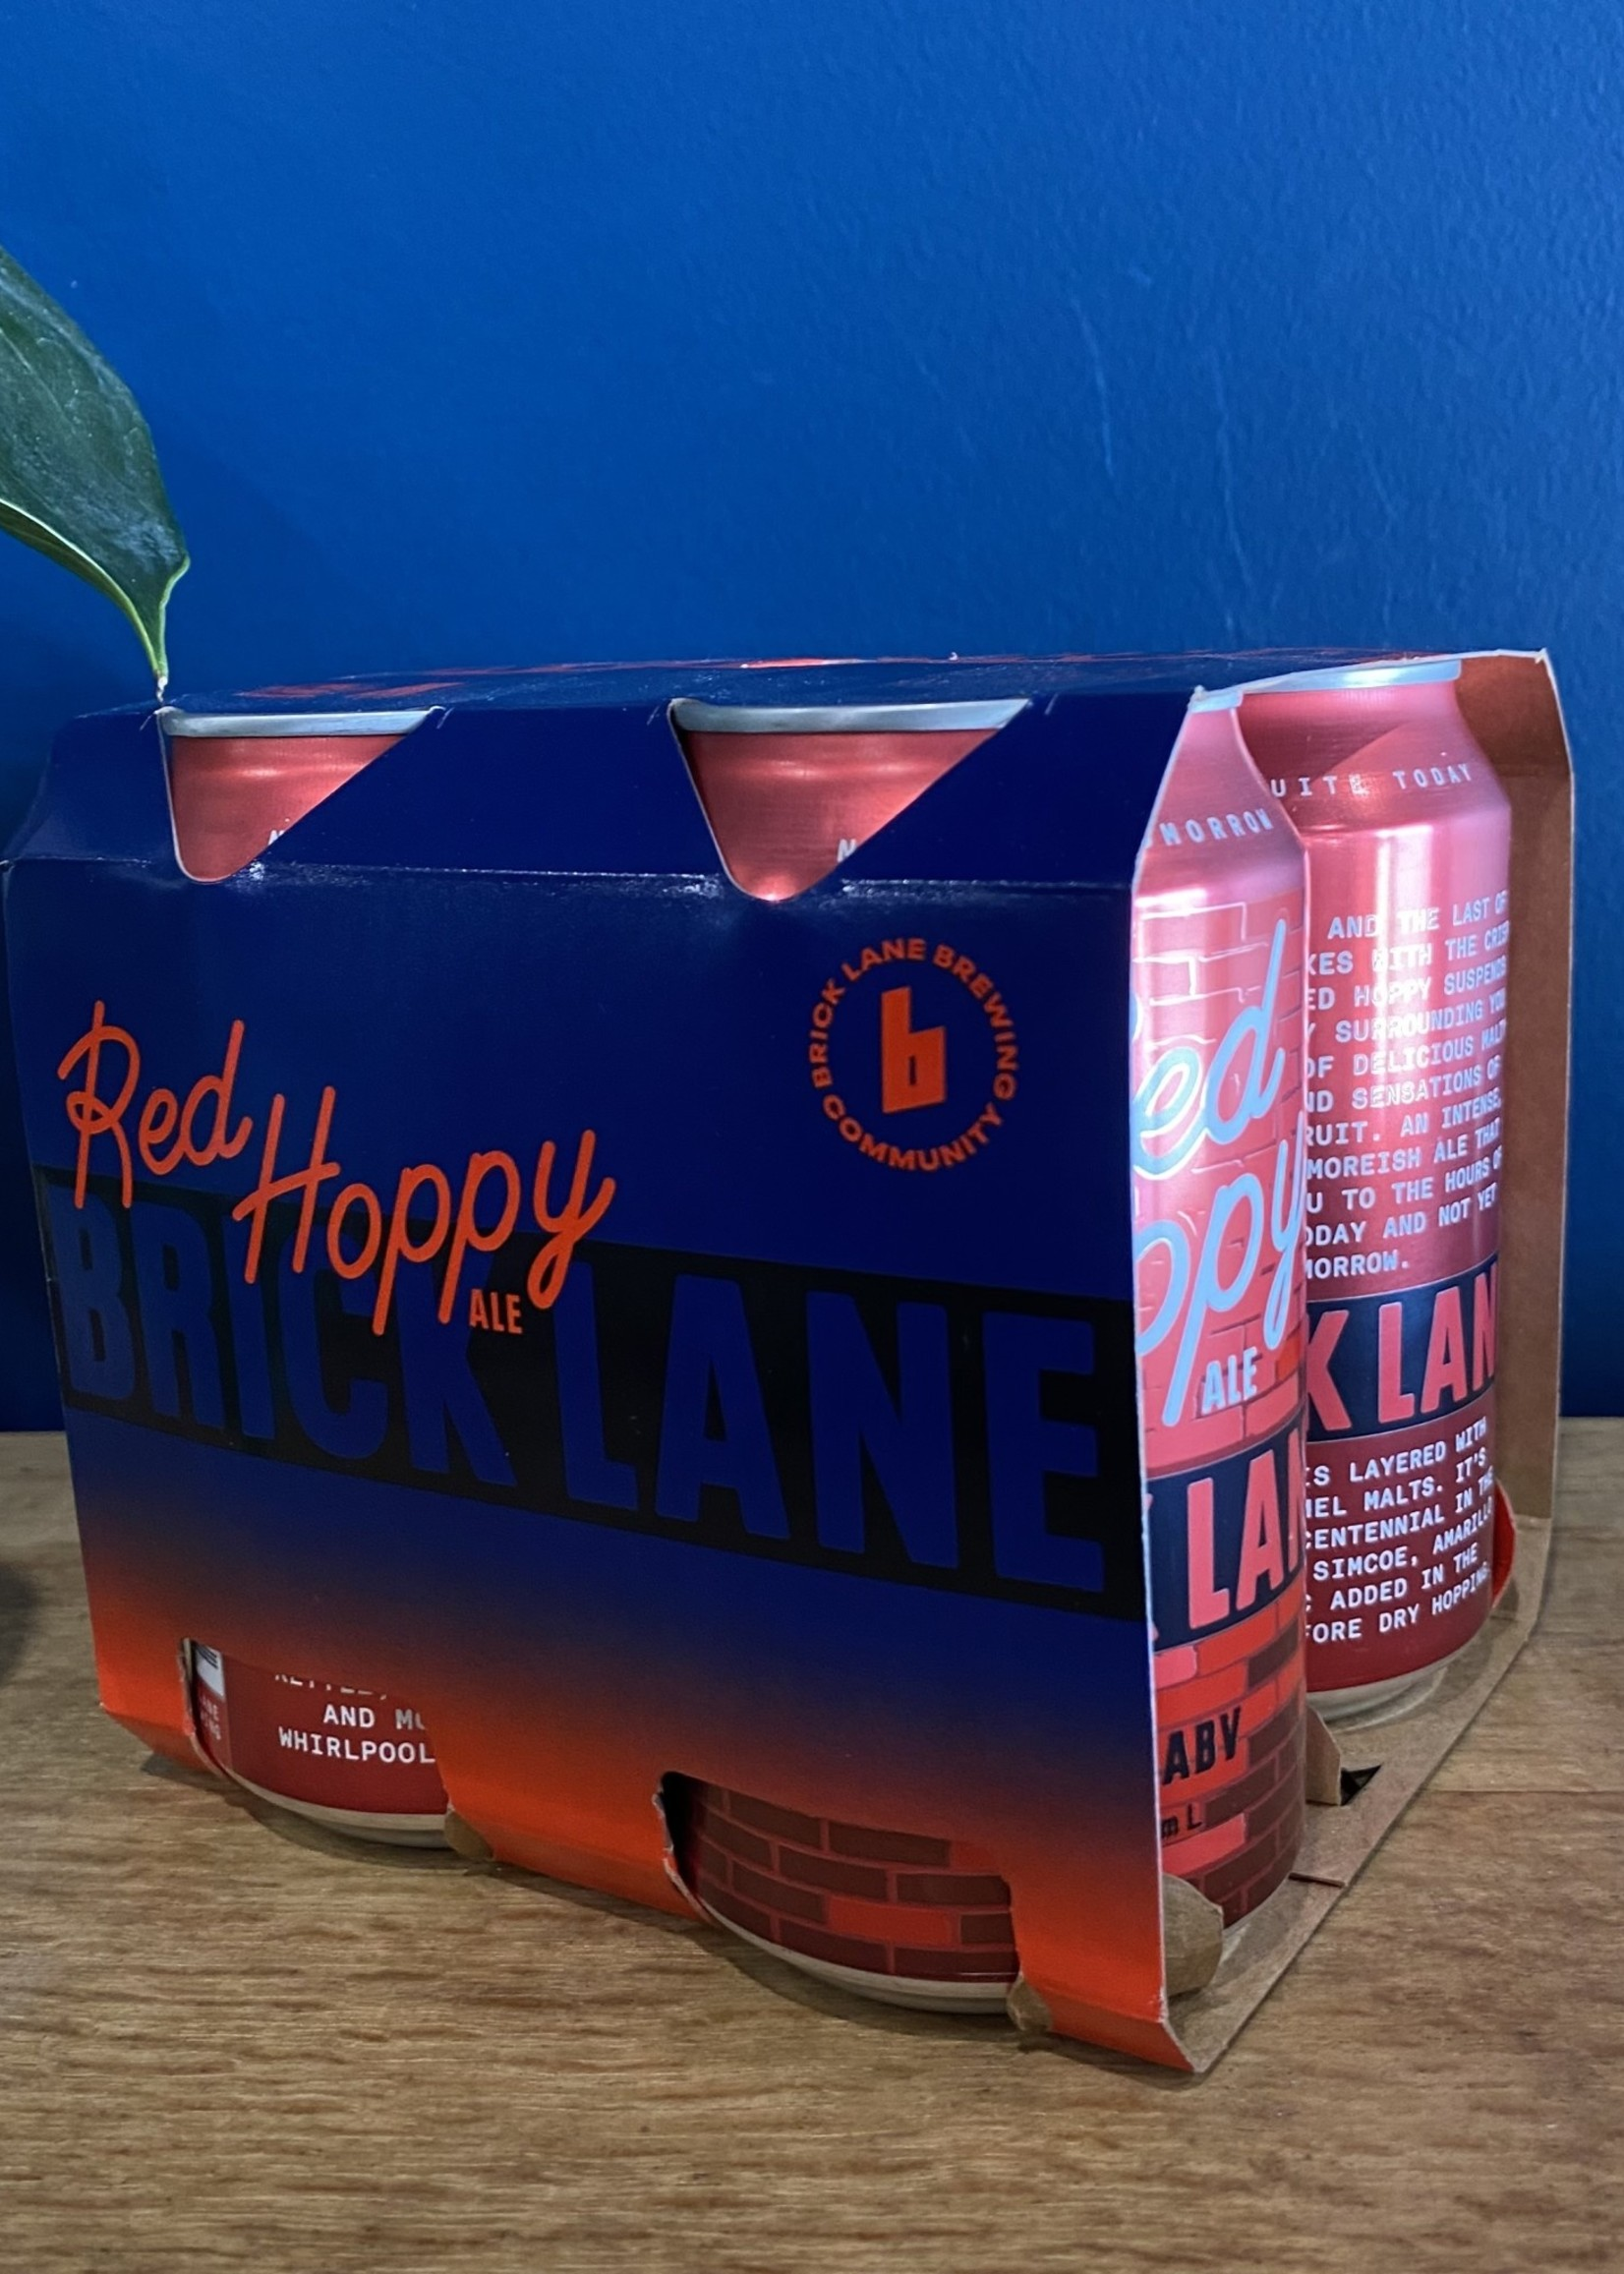 Brick Lane Brewing Brick Lane Red Hoppy Ale